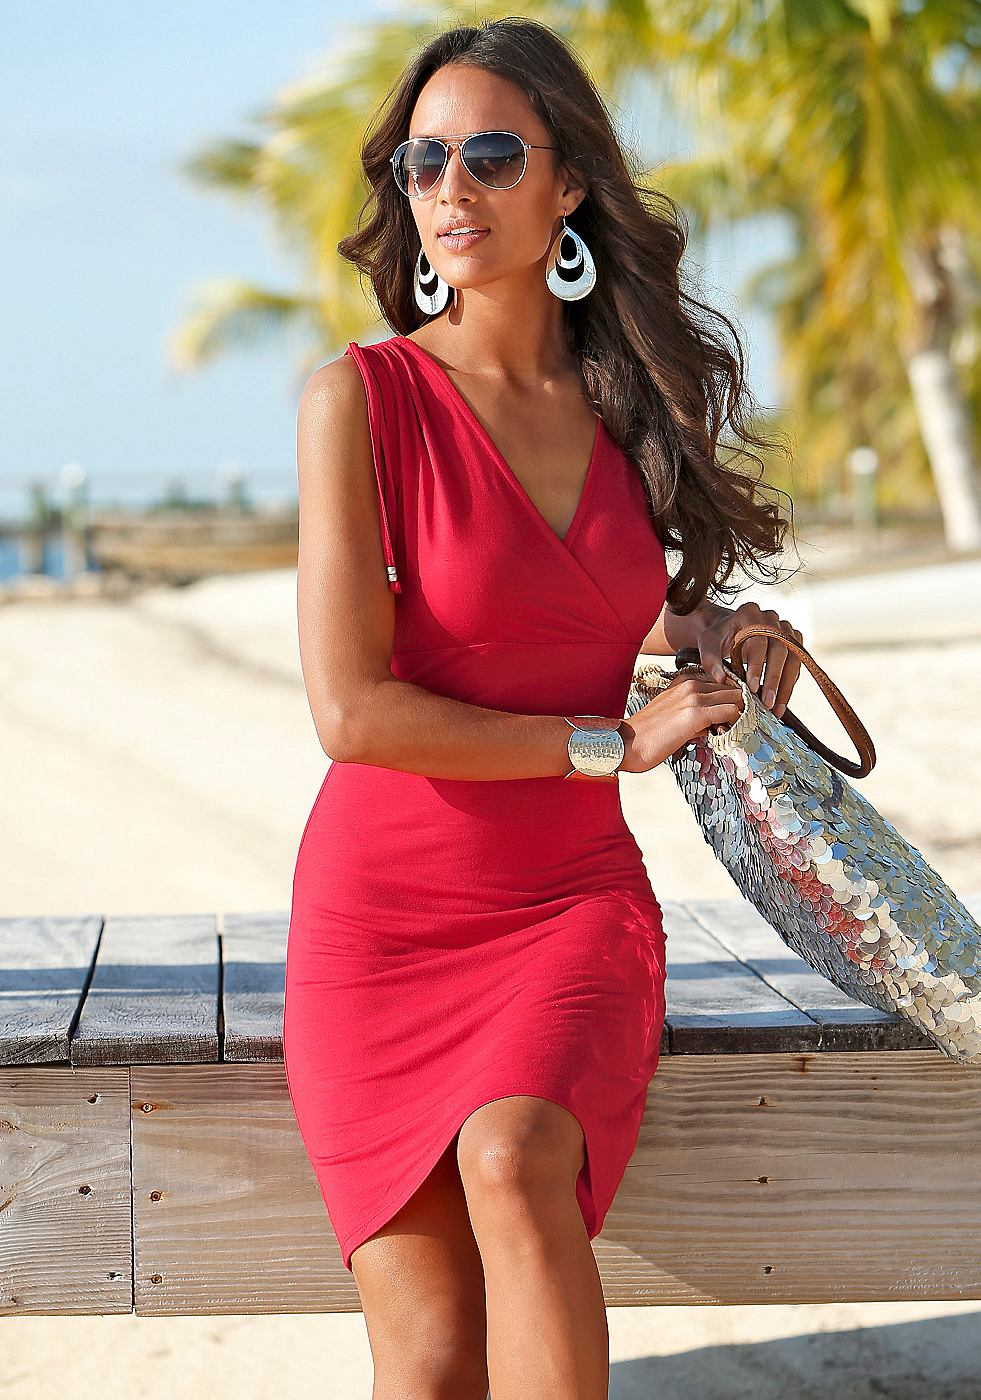 Beachtime Strandjurk in wikkel-look rood